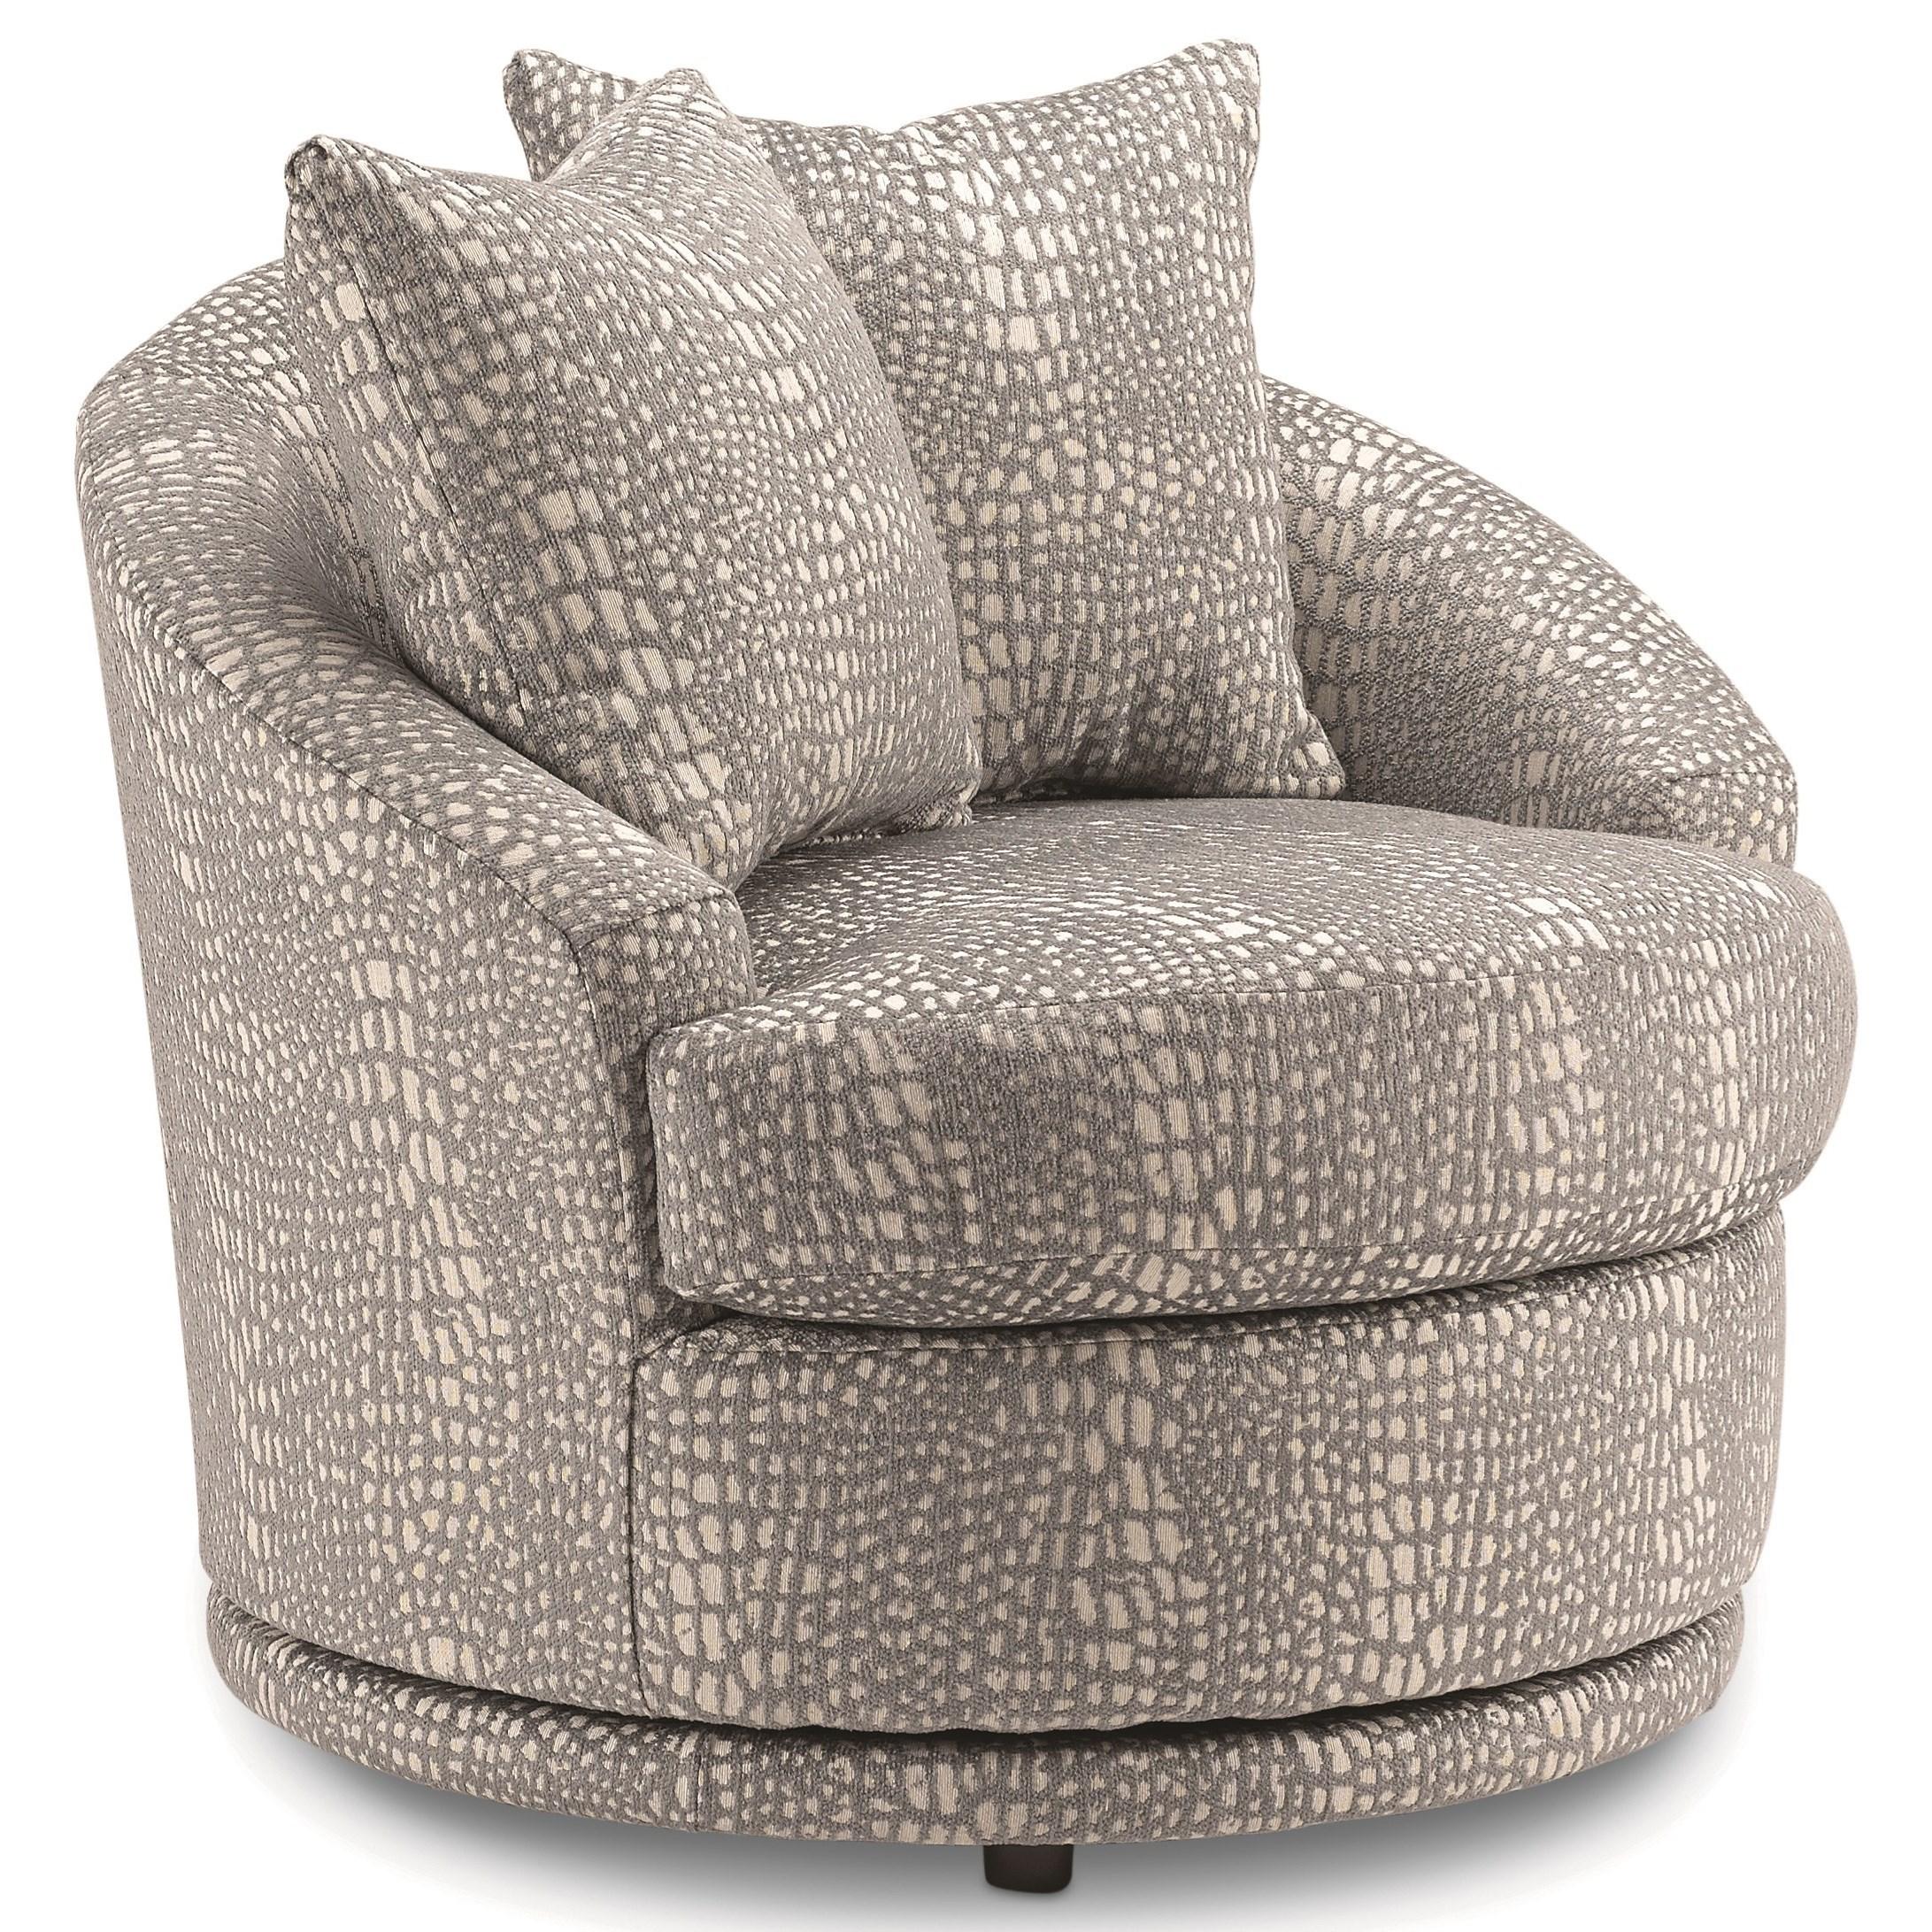 Alanna Swivel Barrel Chair by Best Home Furnishings at Best Home Furnishings